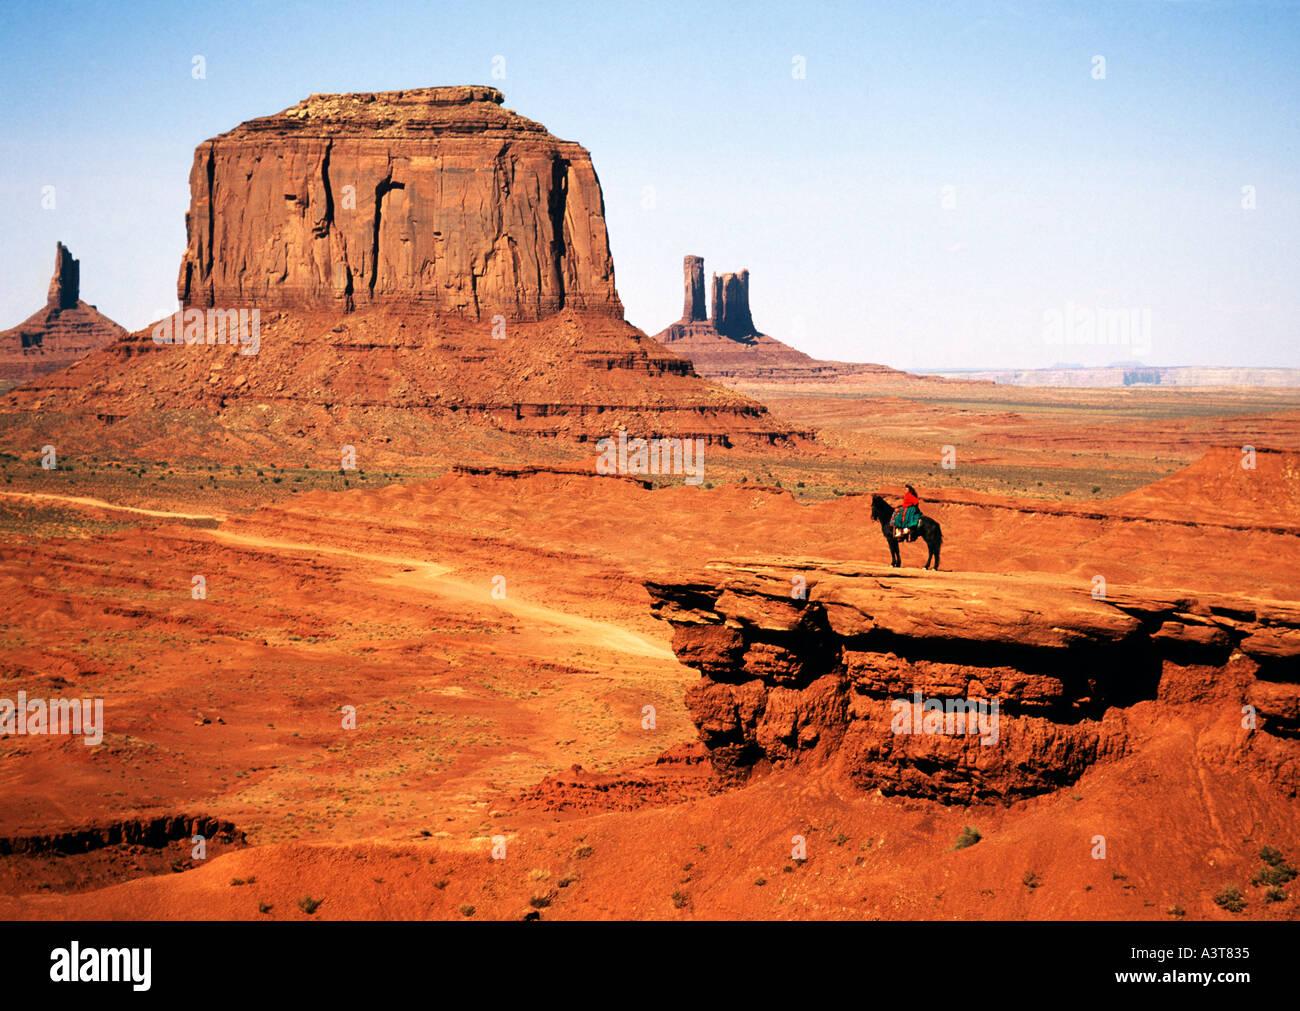 United States of America, Utah, Arizona, Monument Valley, Navajo Tribal Park - Stock Image